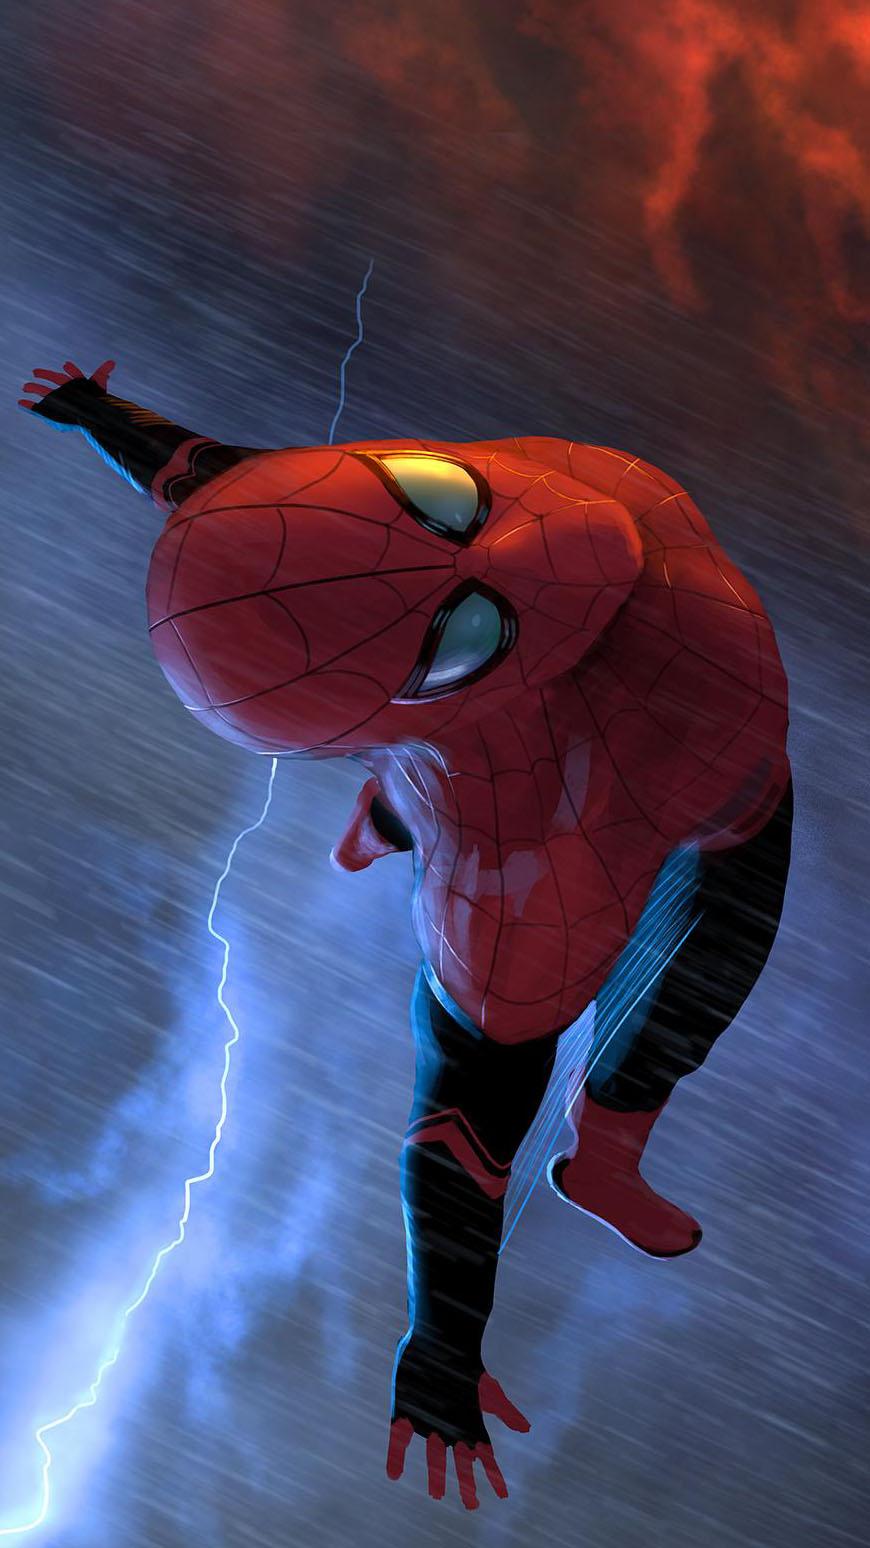 Flying Spiderman iPhone Wallpaper